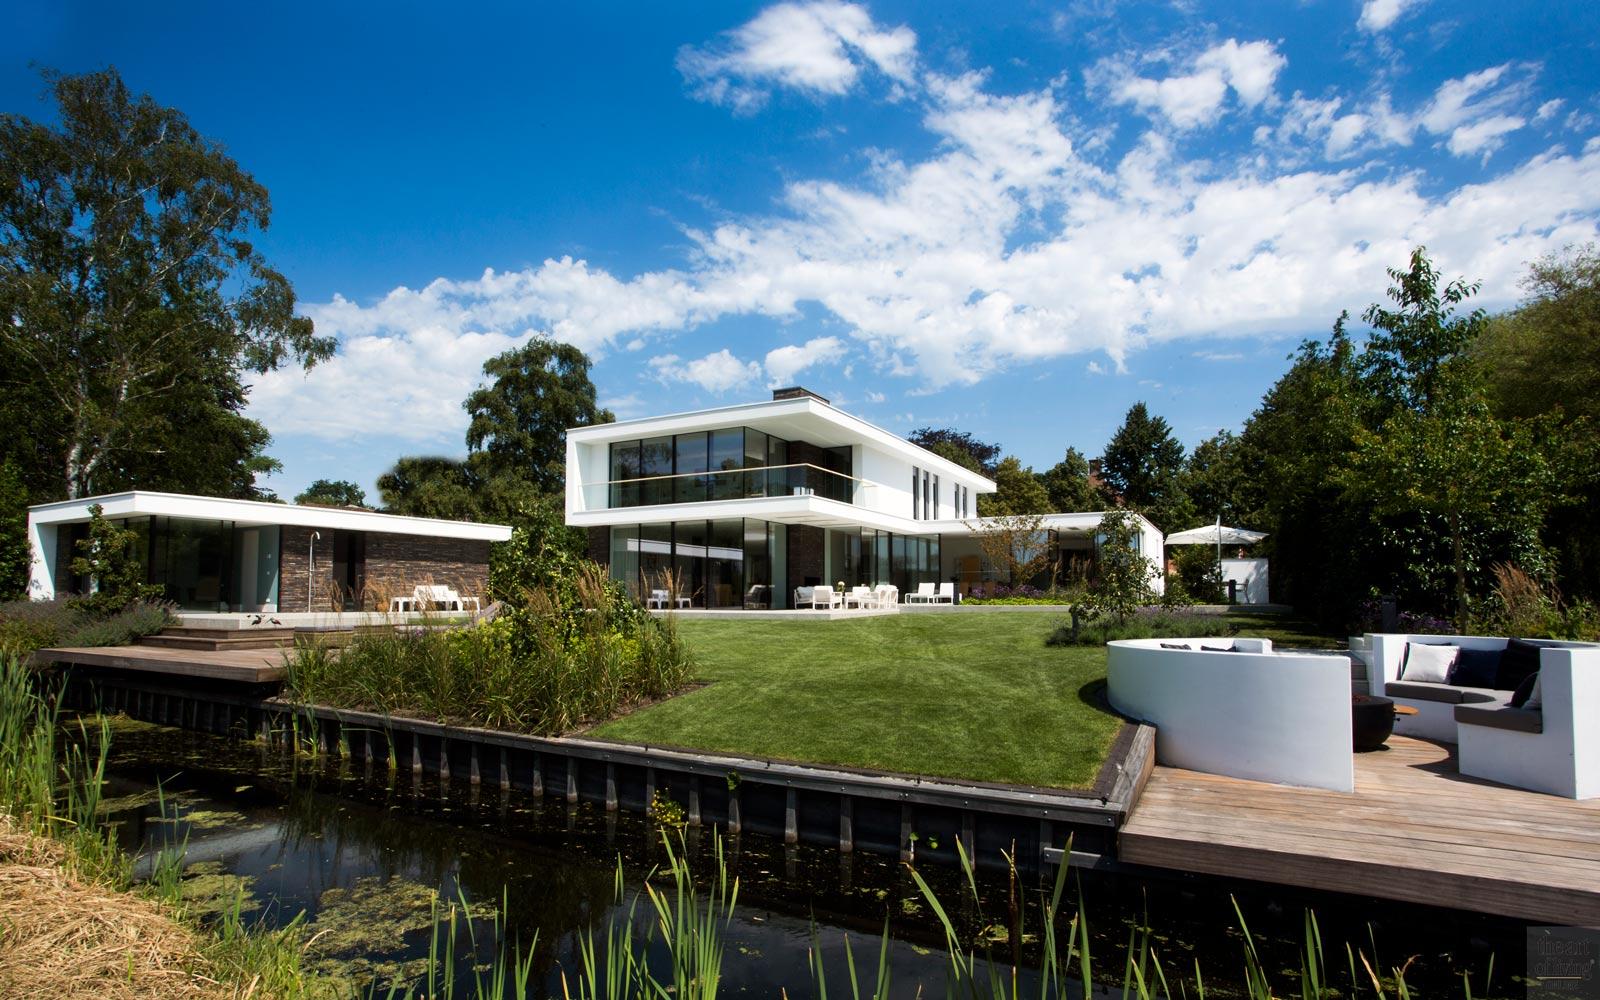 5 X Exclusieve Moderne Villa The Art Of Living Nl